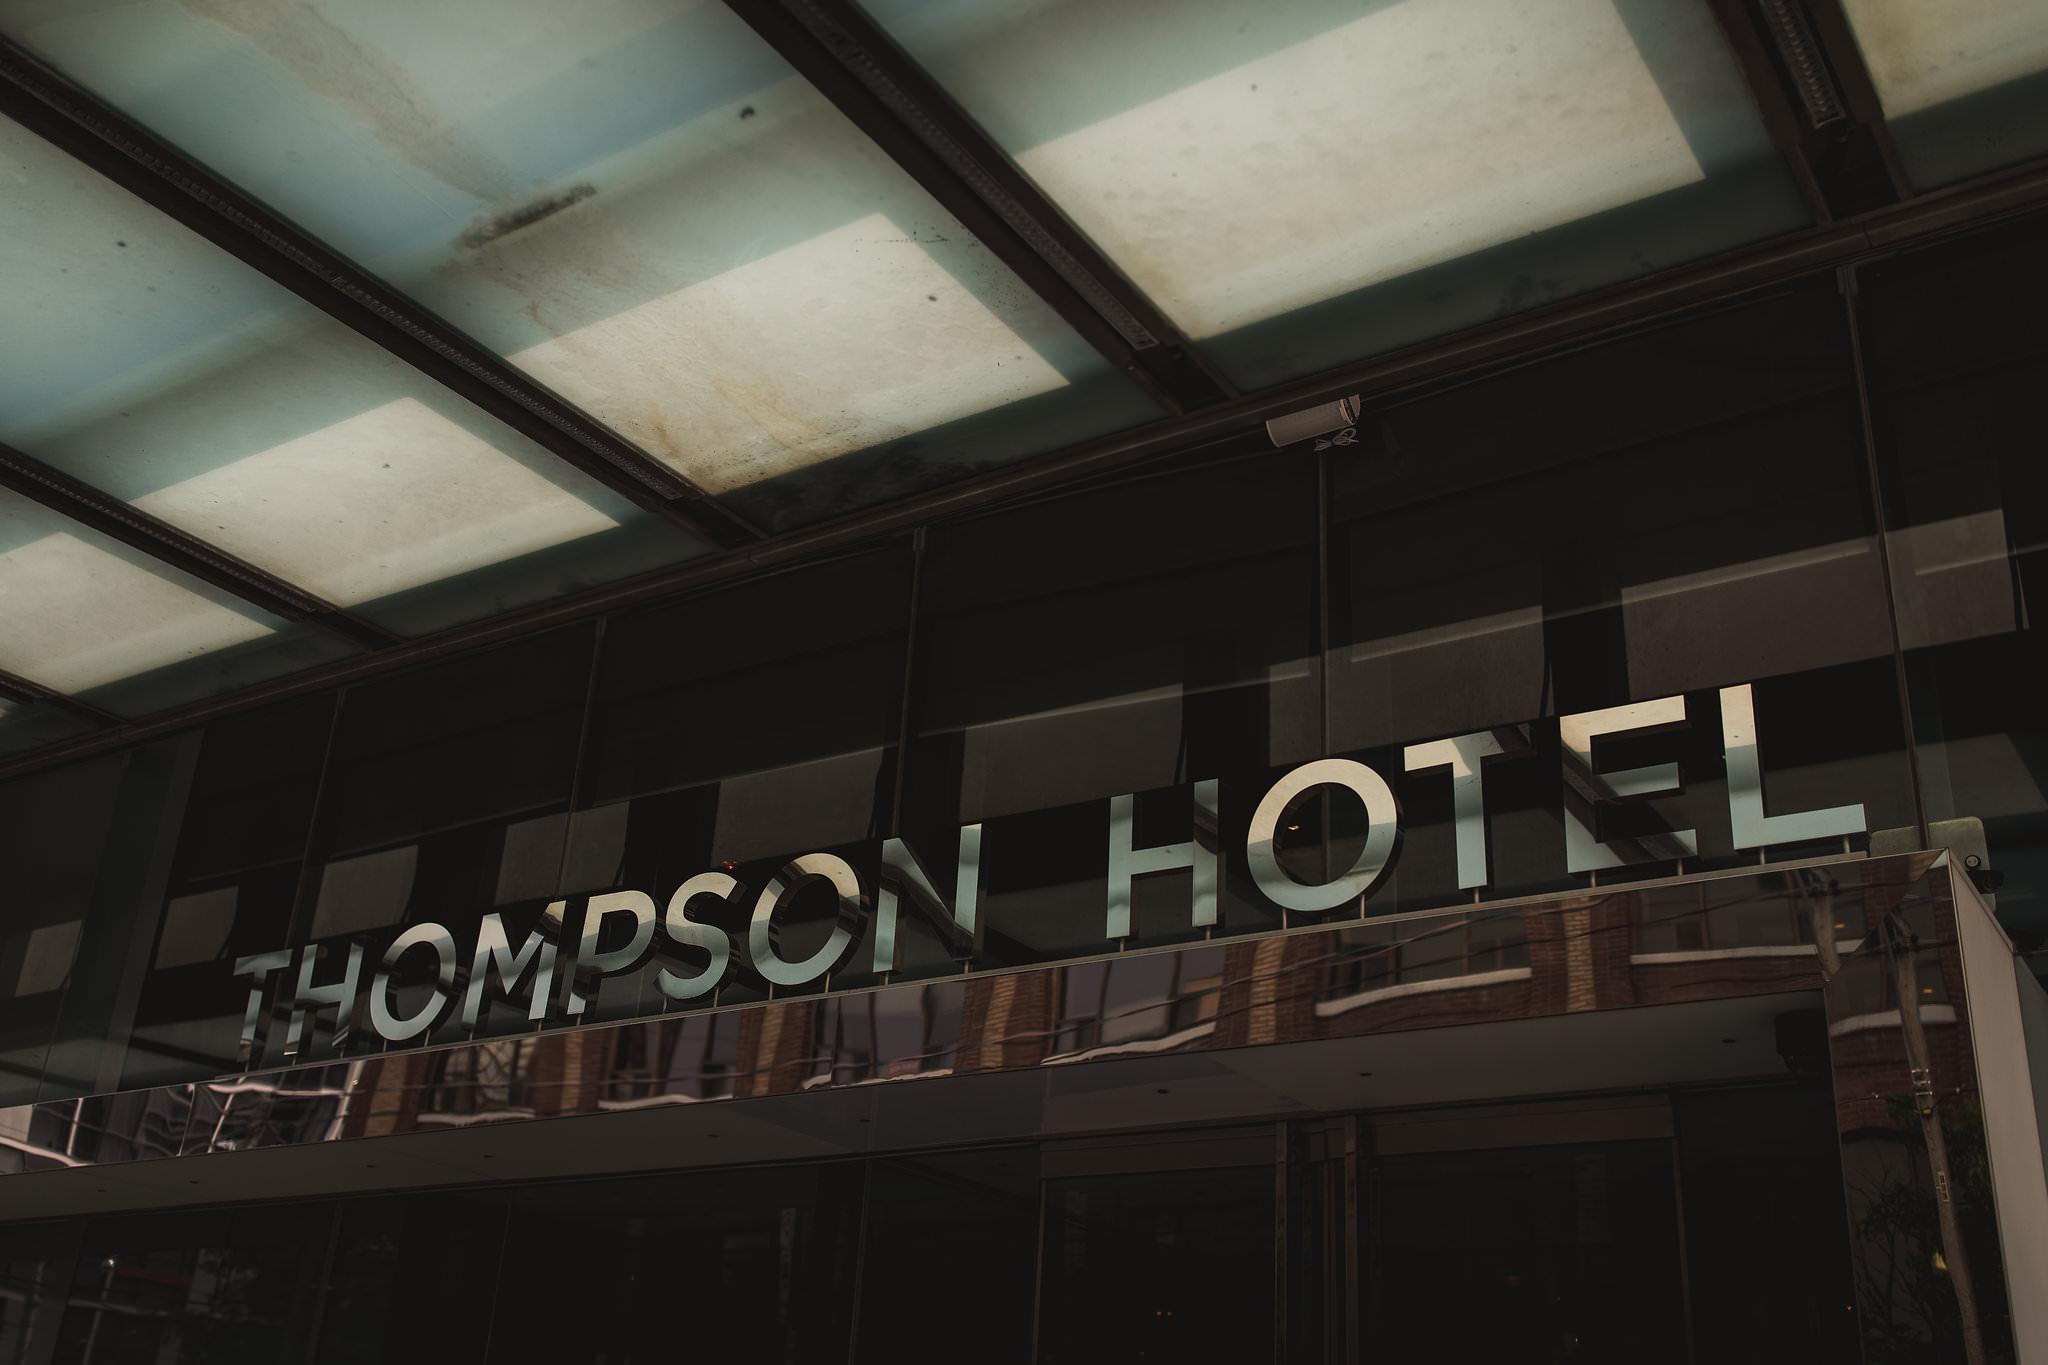 Cristin Rob Thompson Hotel Wedding Photos 102 - Thompson Hotel Wedding Photos